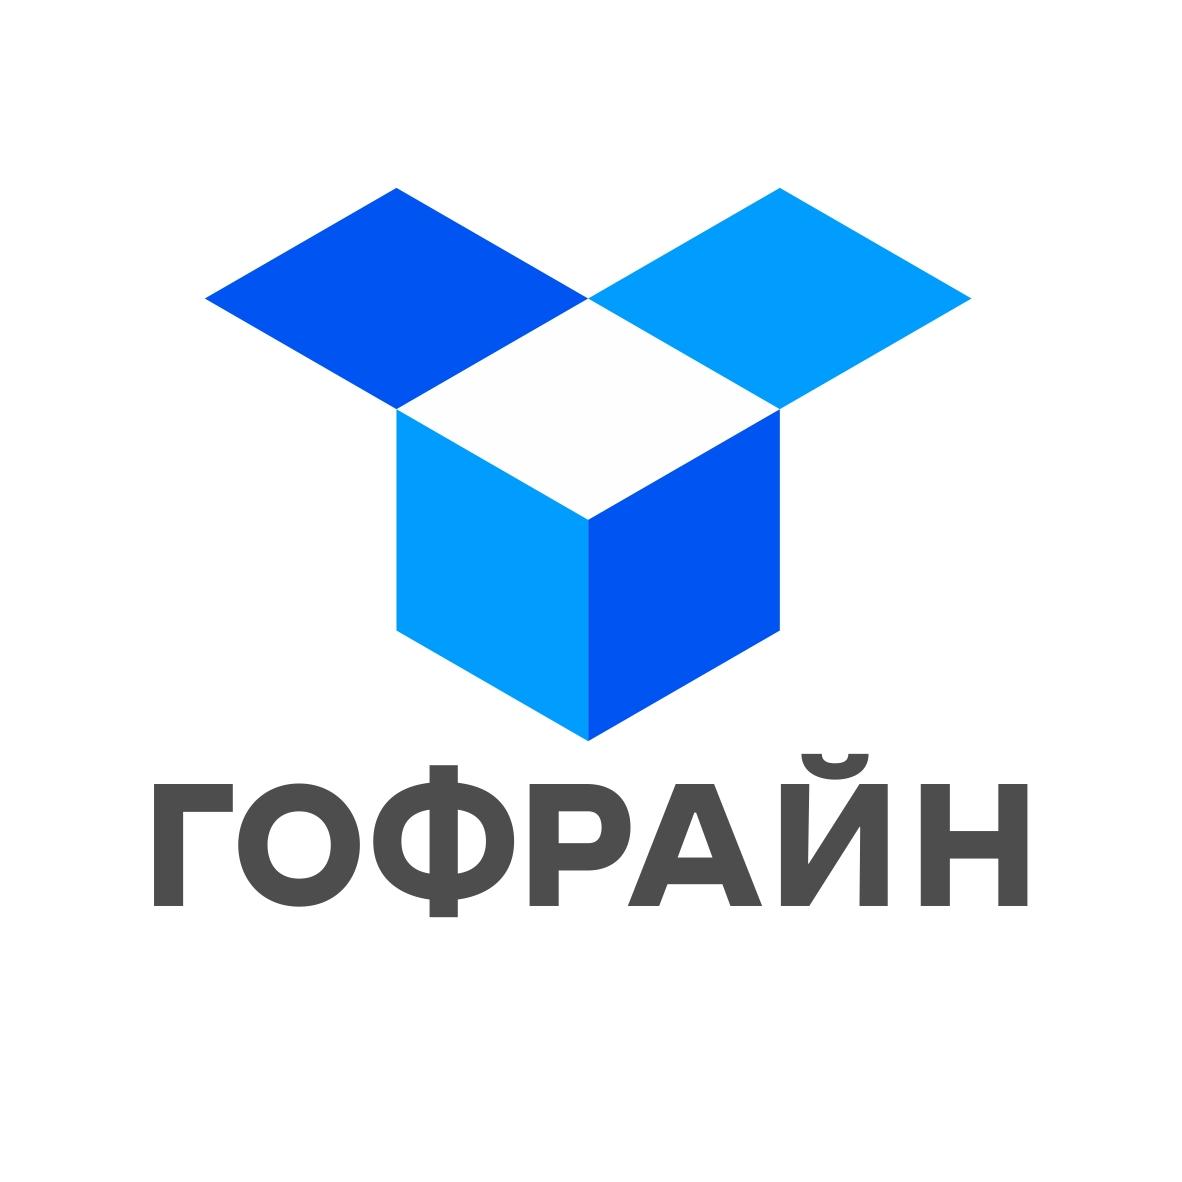 Логотип для компании по реализации упаковки из гофрокартона фото f_8215cdba6373ae05.jpg